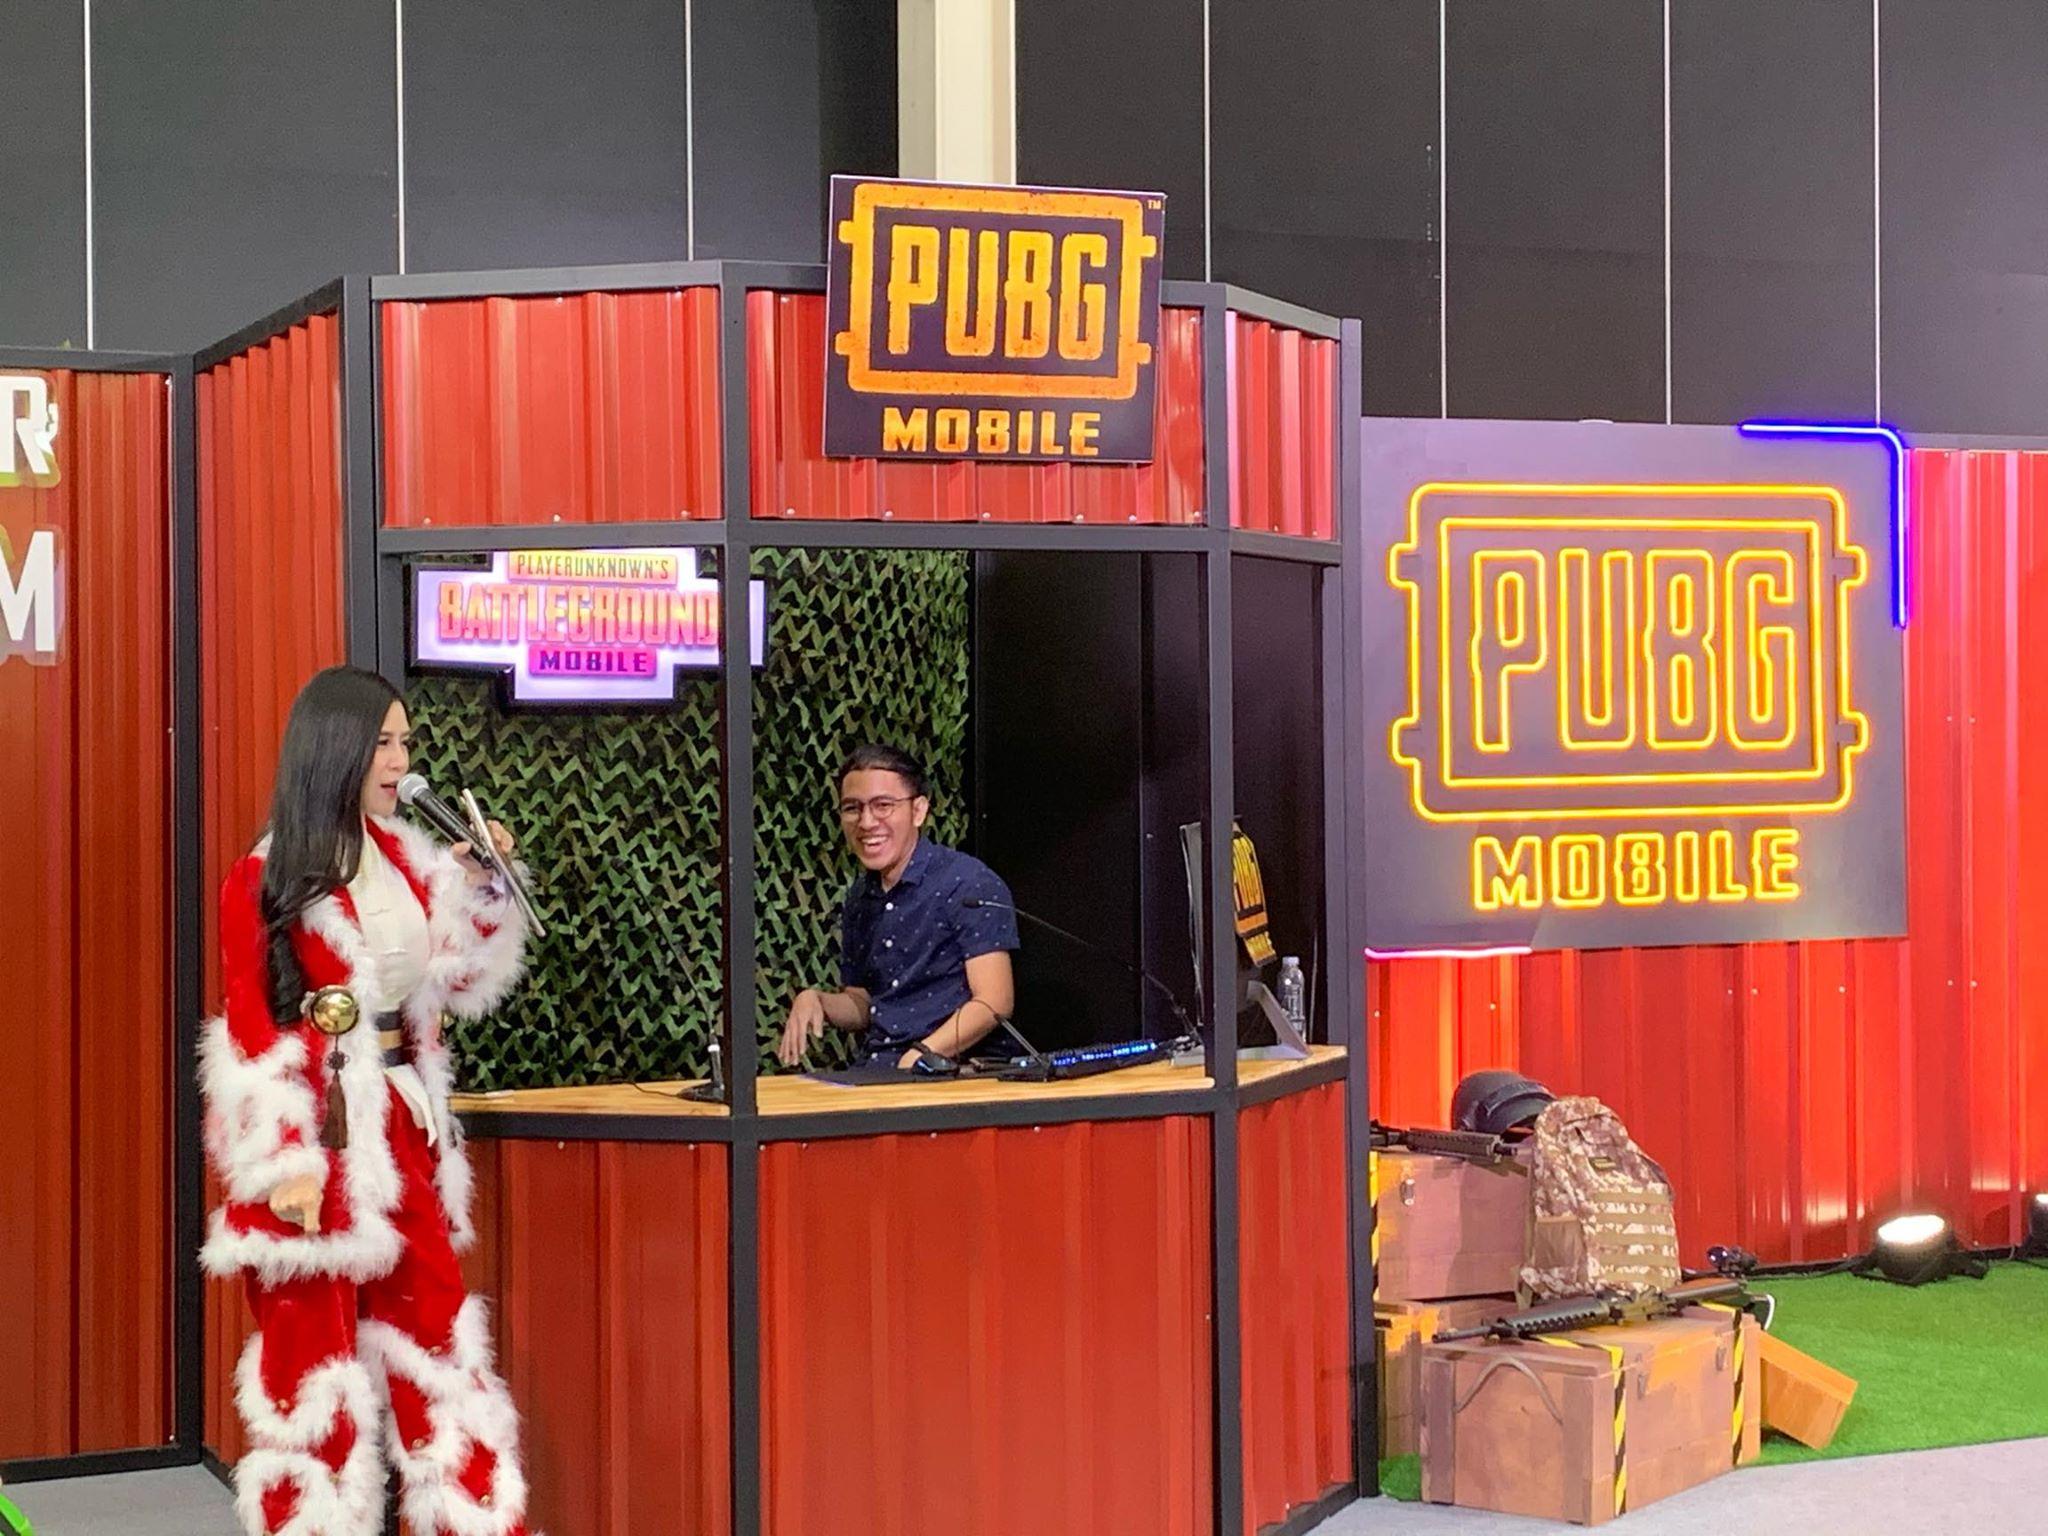 Thailand Game Expo 3112020 8